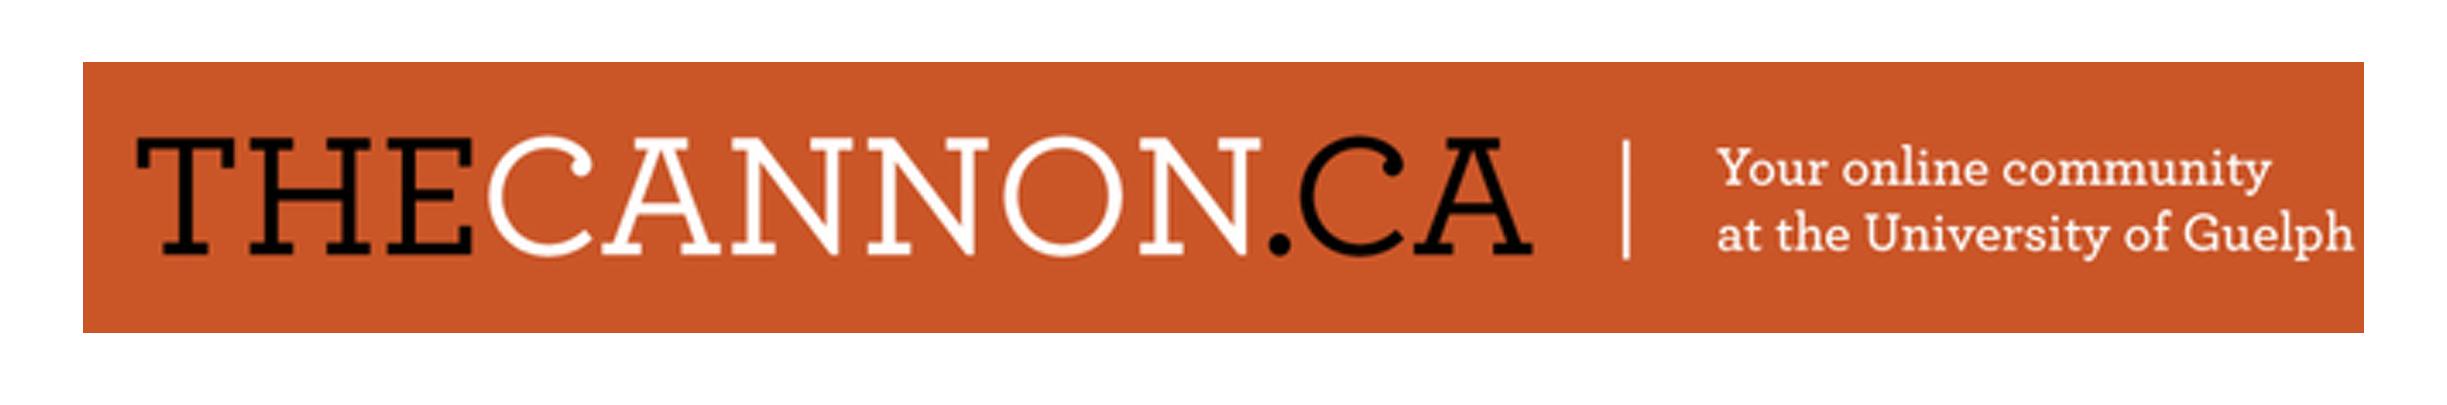 cannon banner - link.jpg